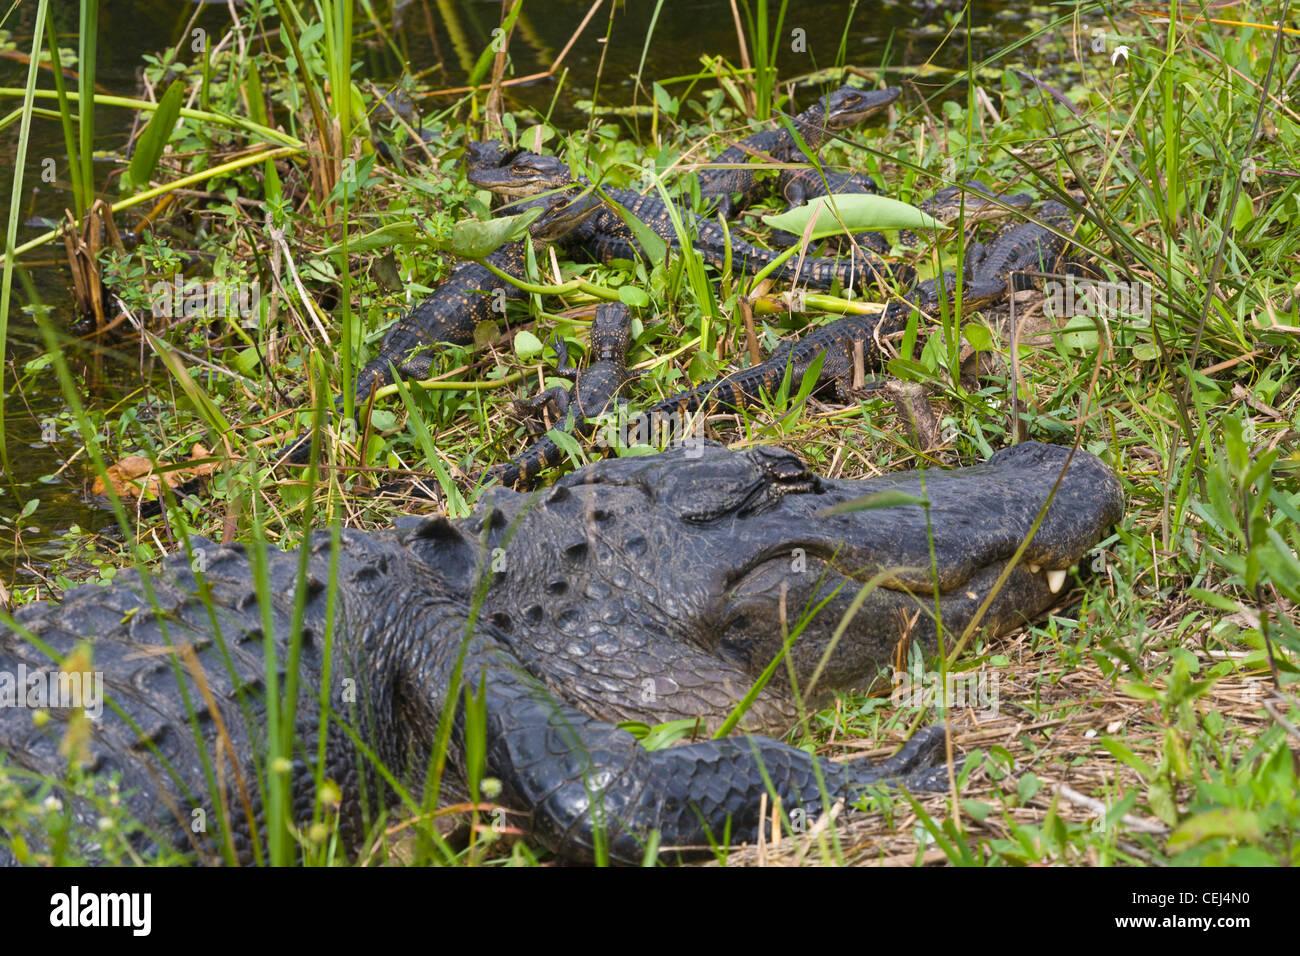 Alligator Baby Worksheet